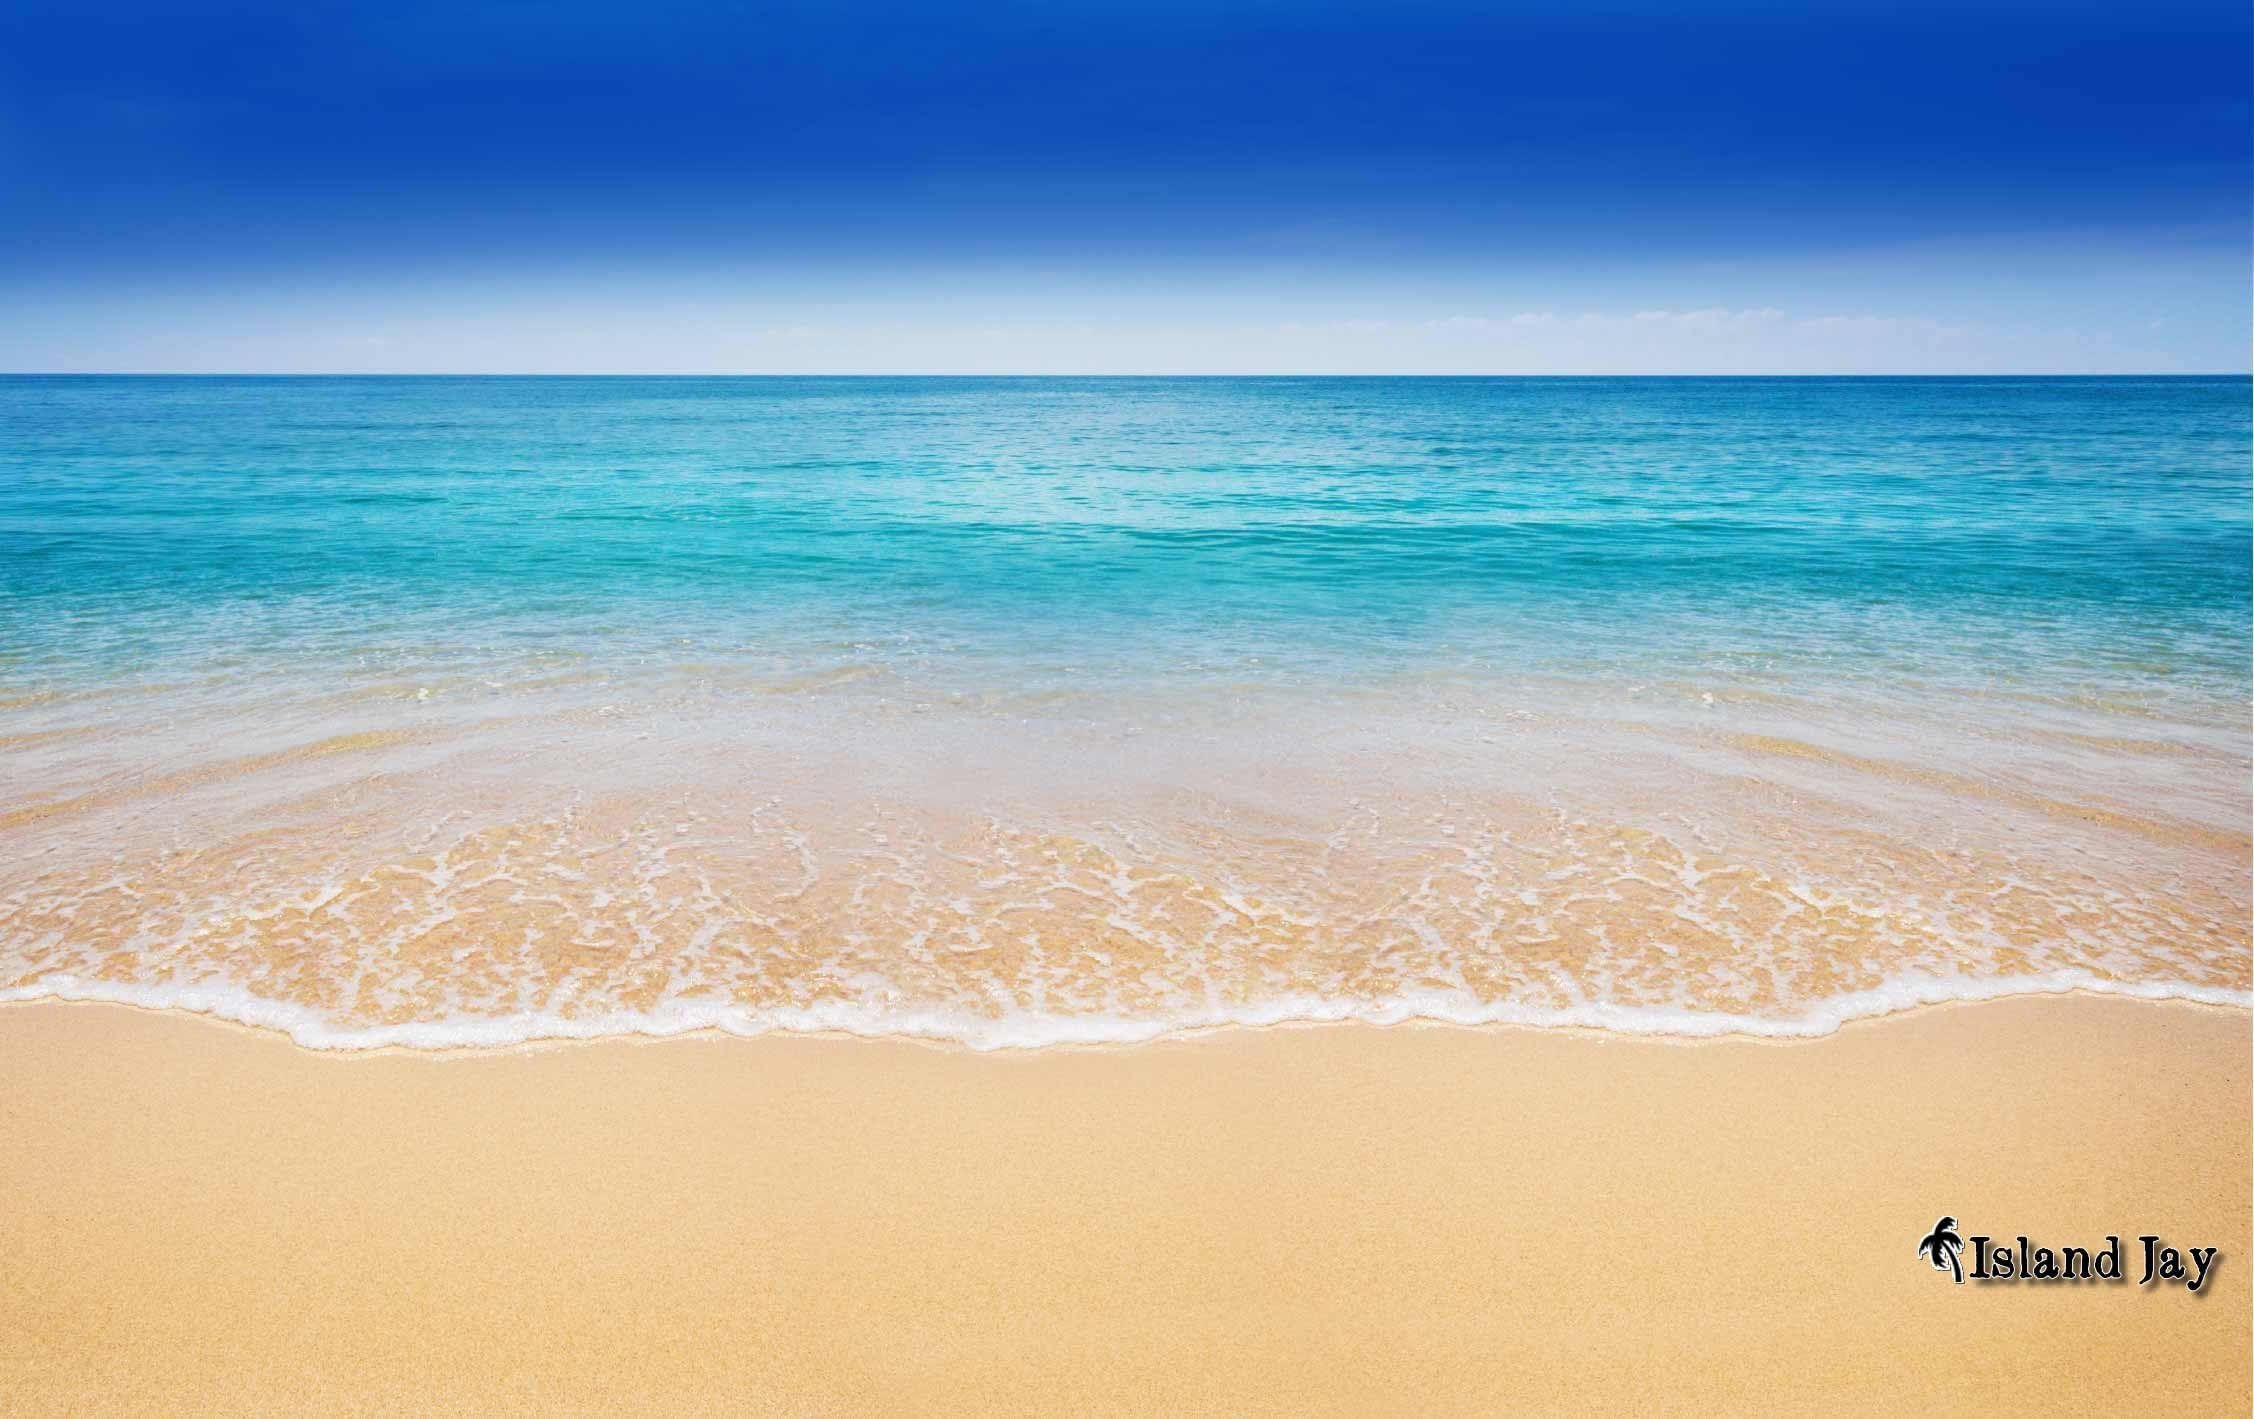 Just a beautiful beach scene | Beautiful Tropical ... - photo#21